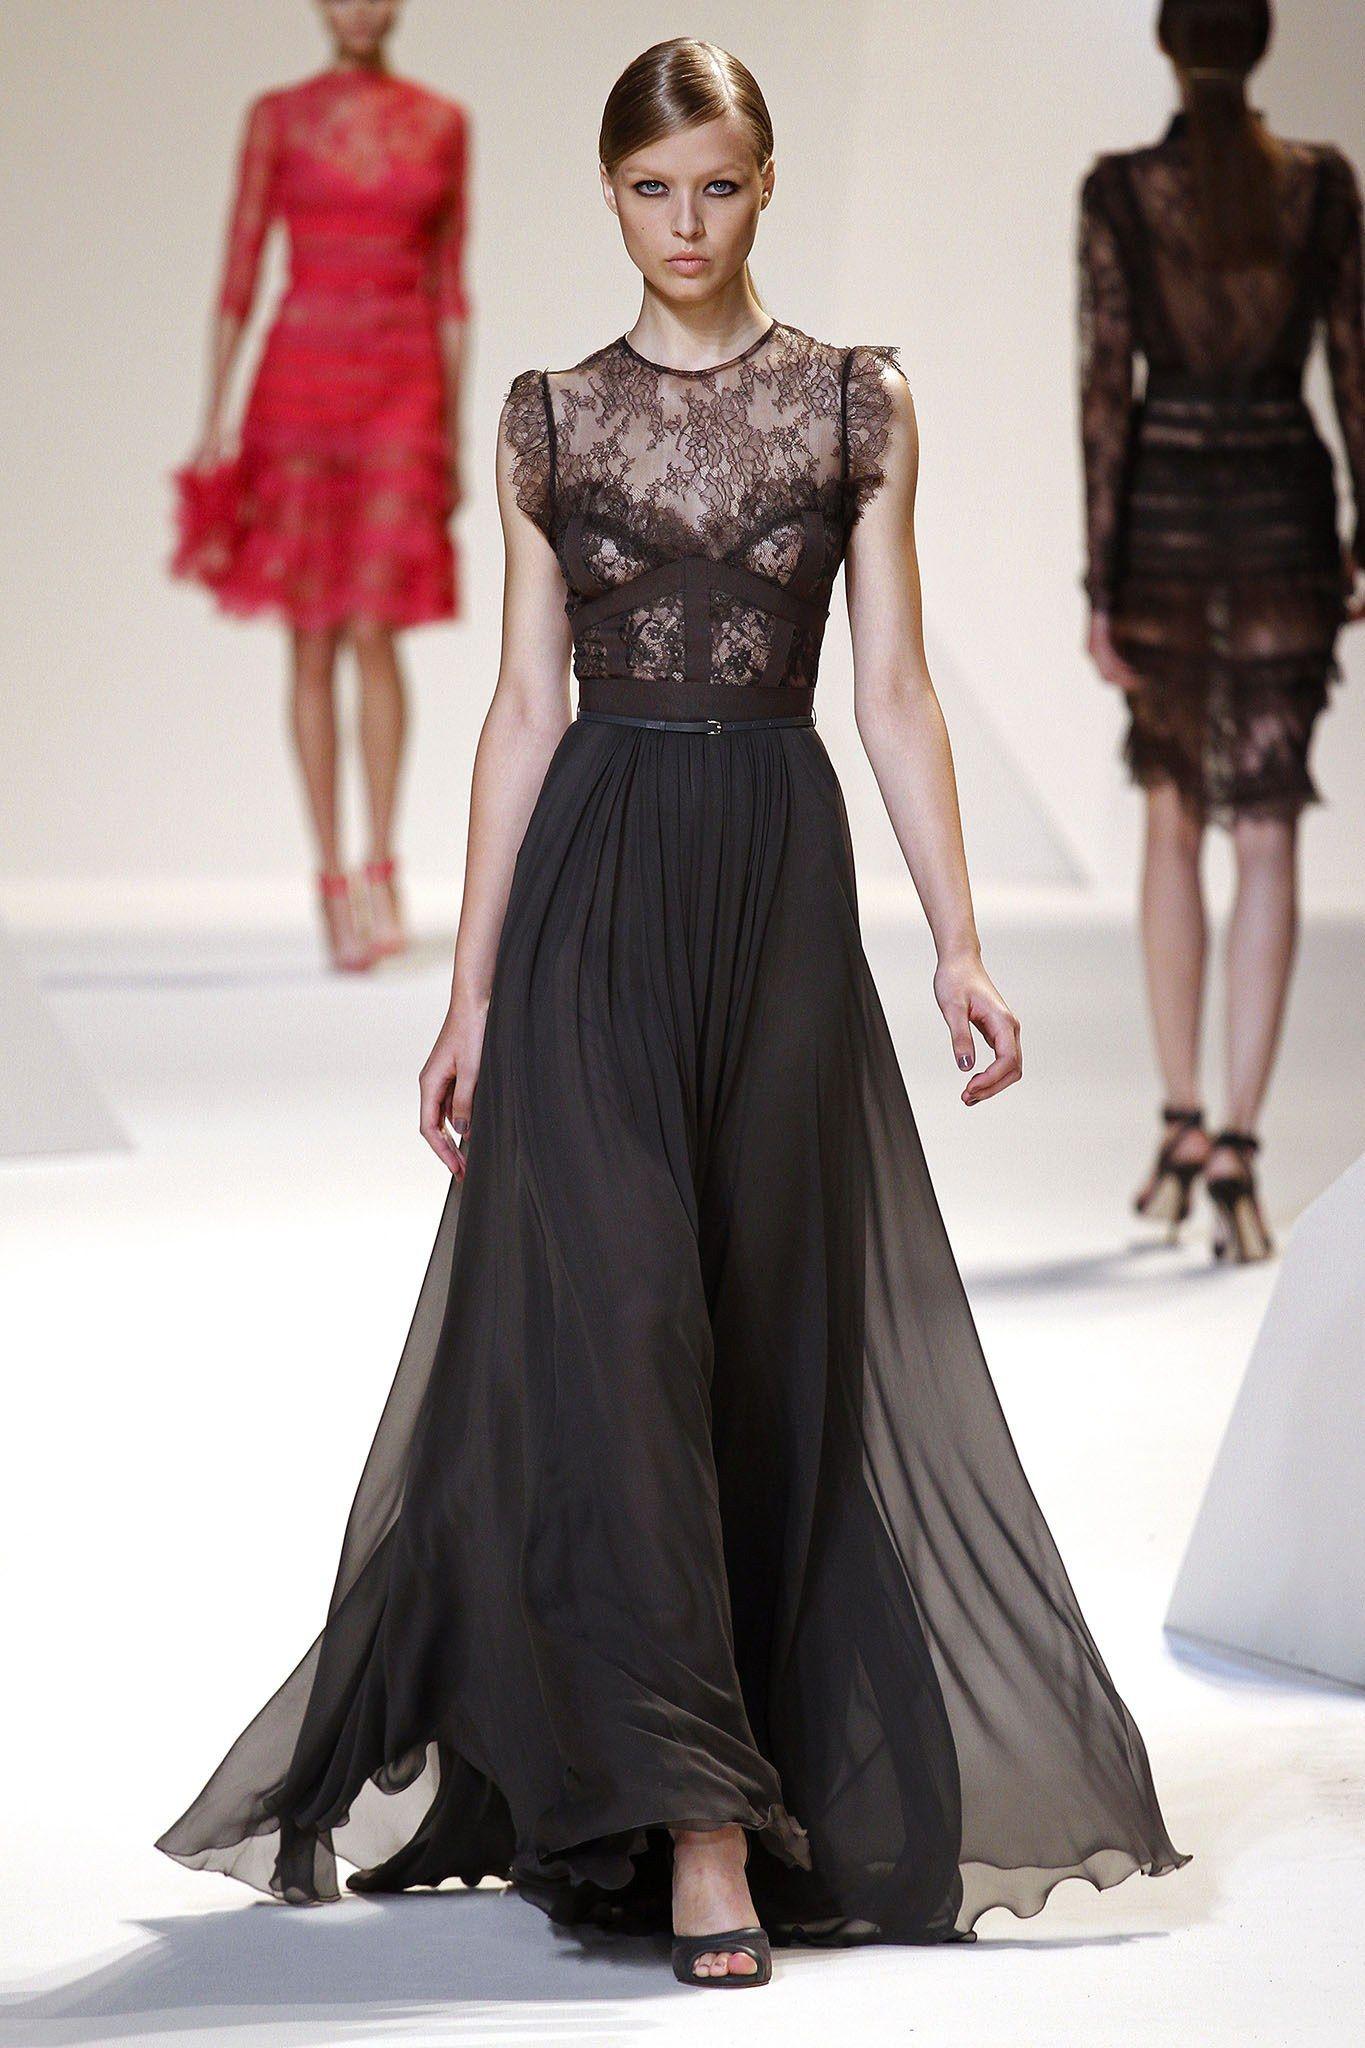 Elie Saab Spring 2013 Ready-to-Wear Fashion Show - Natasha Remarchuk (OUI)